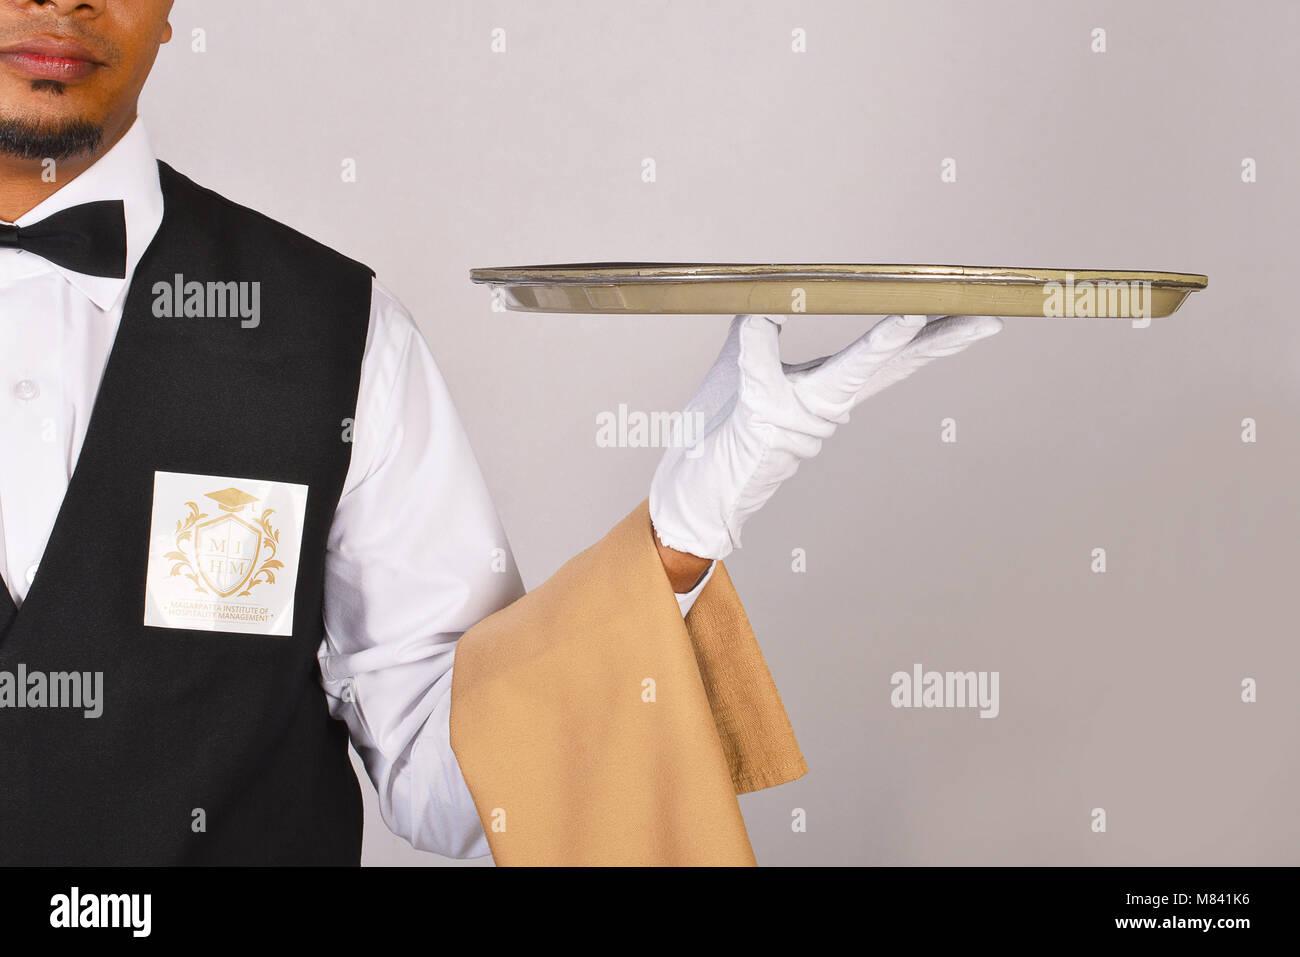 Atemberaubend Hostess Server Fortsetzungsziel Galerie - Entry Level ...